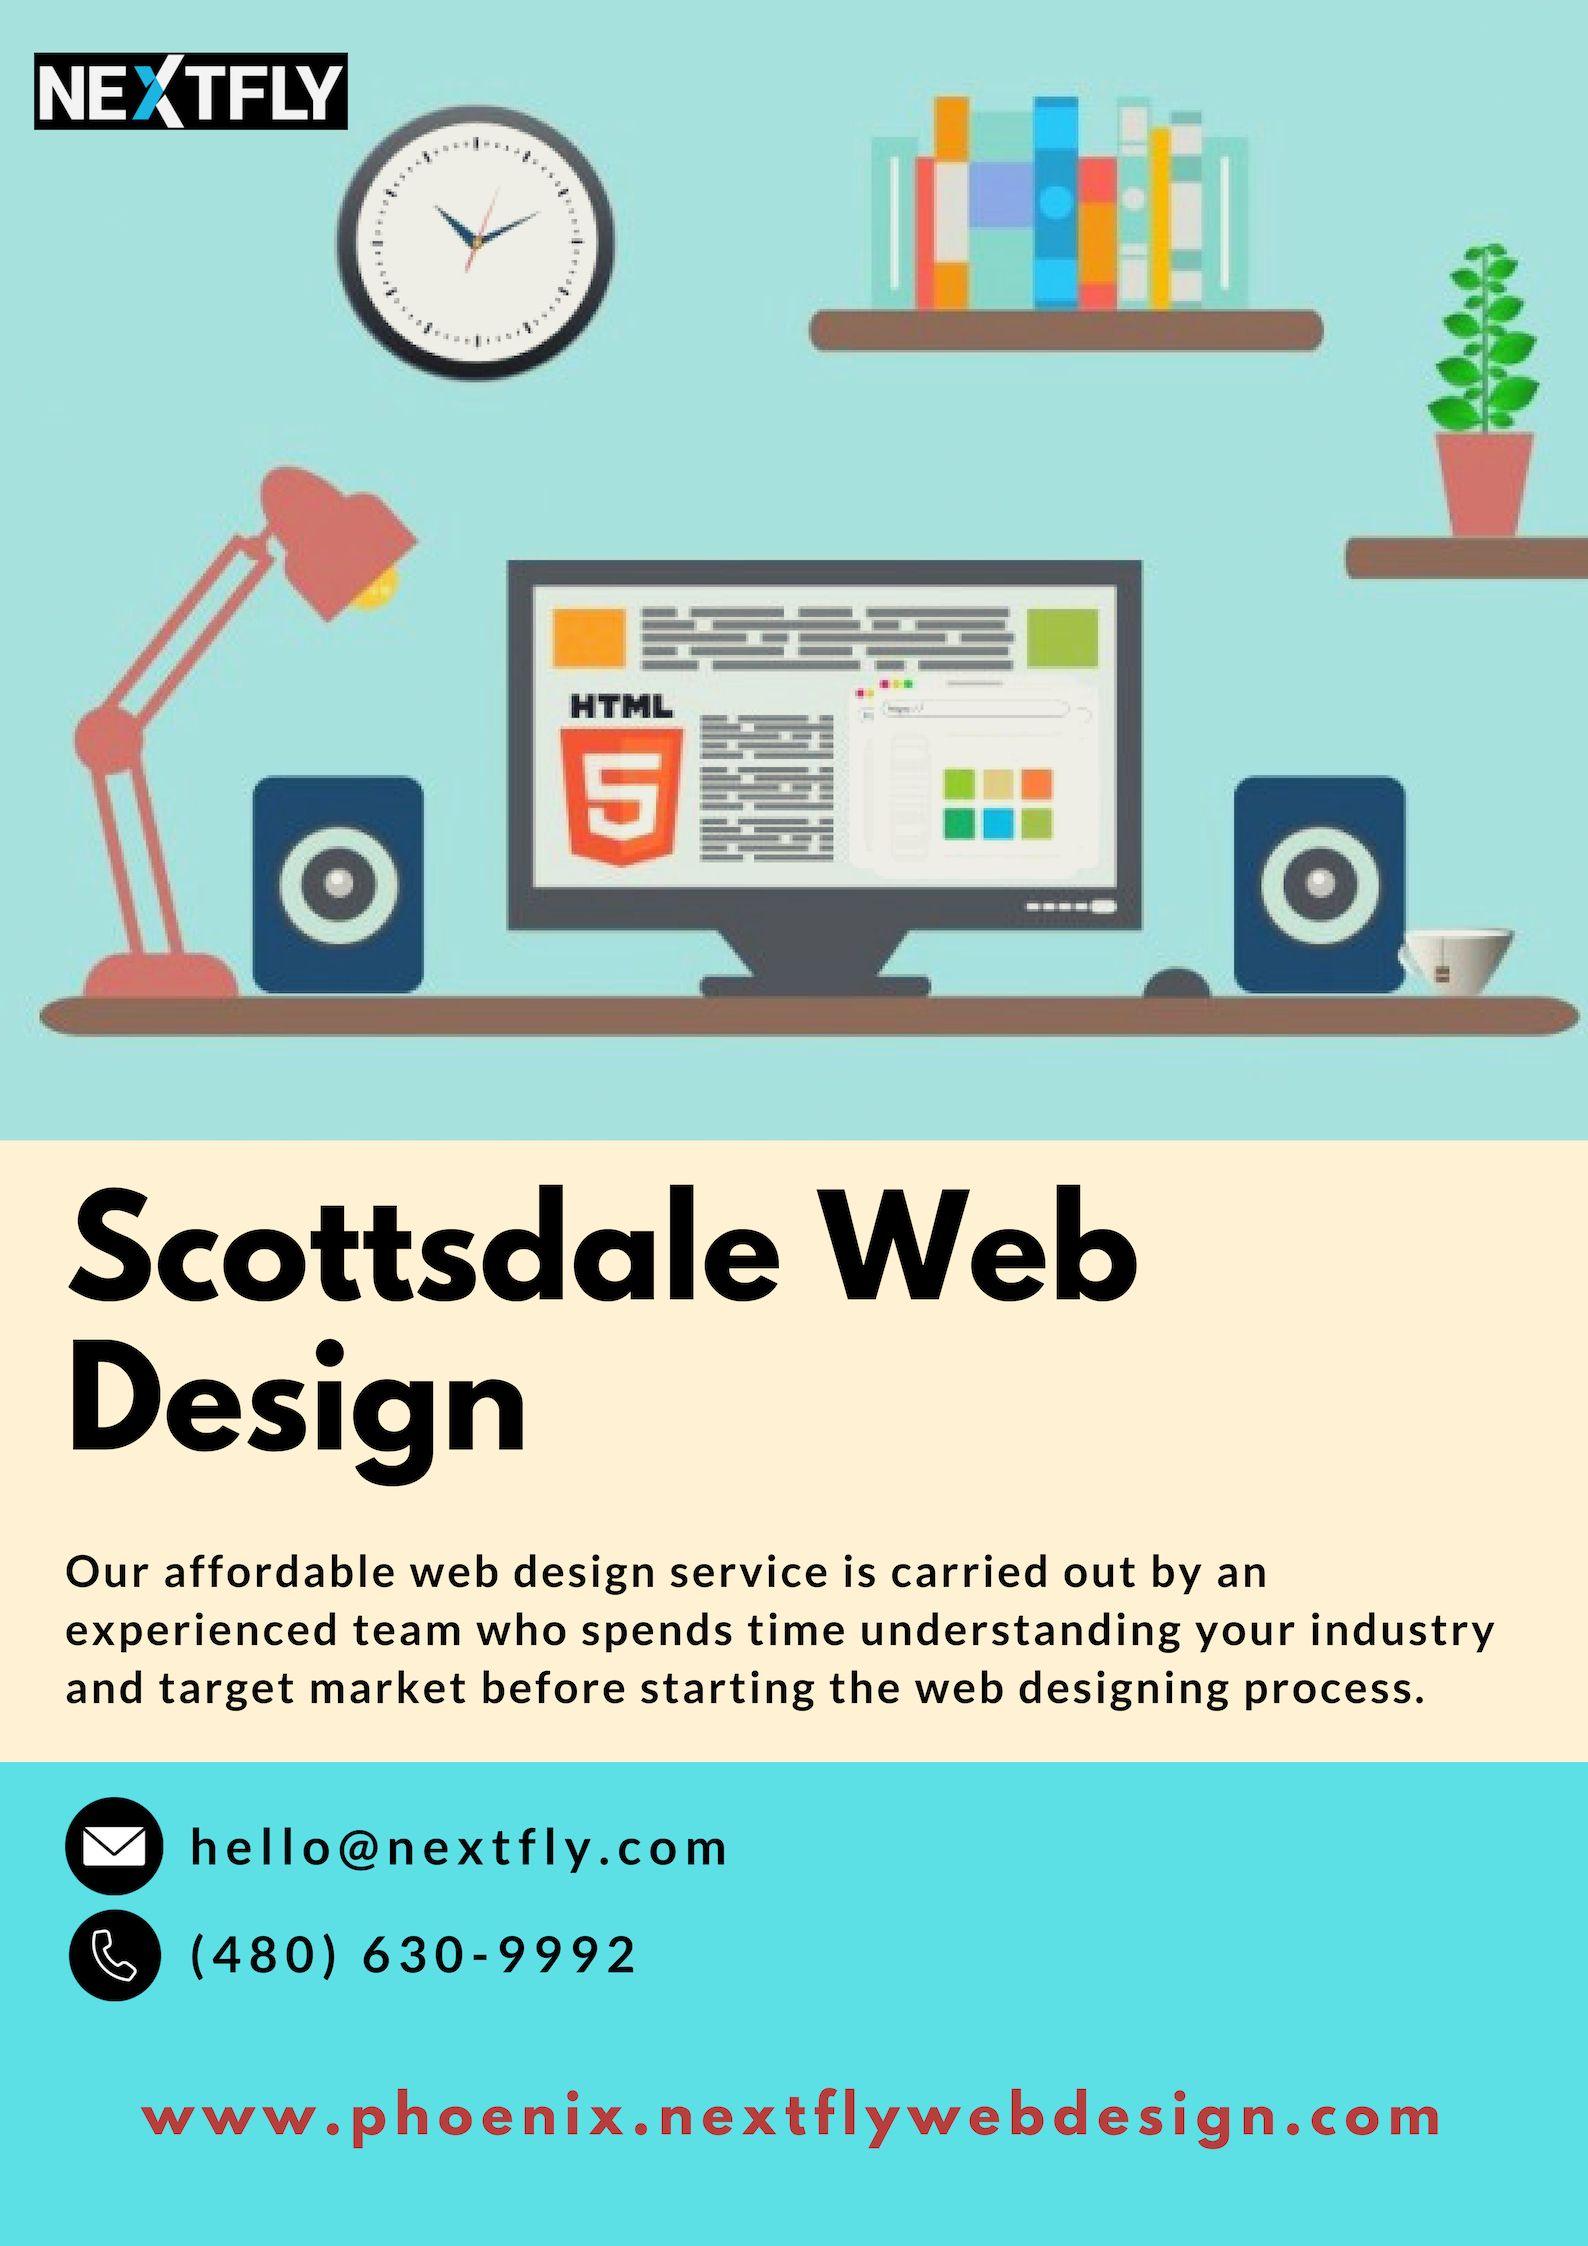 Scottsdale Web Design Web Design Website Design Company Web Development Design